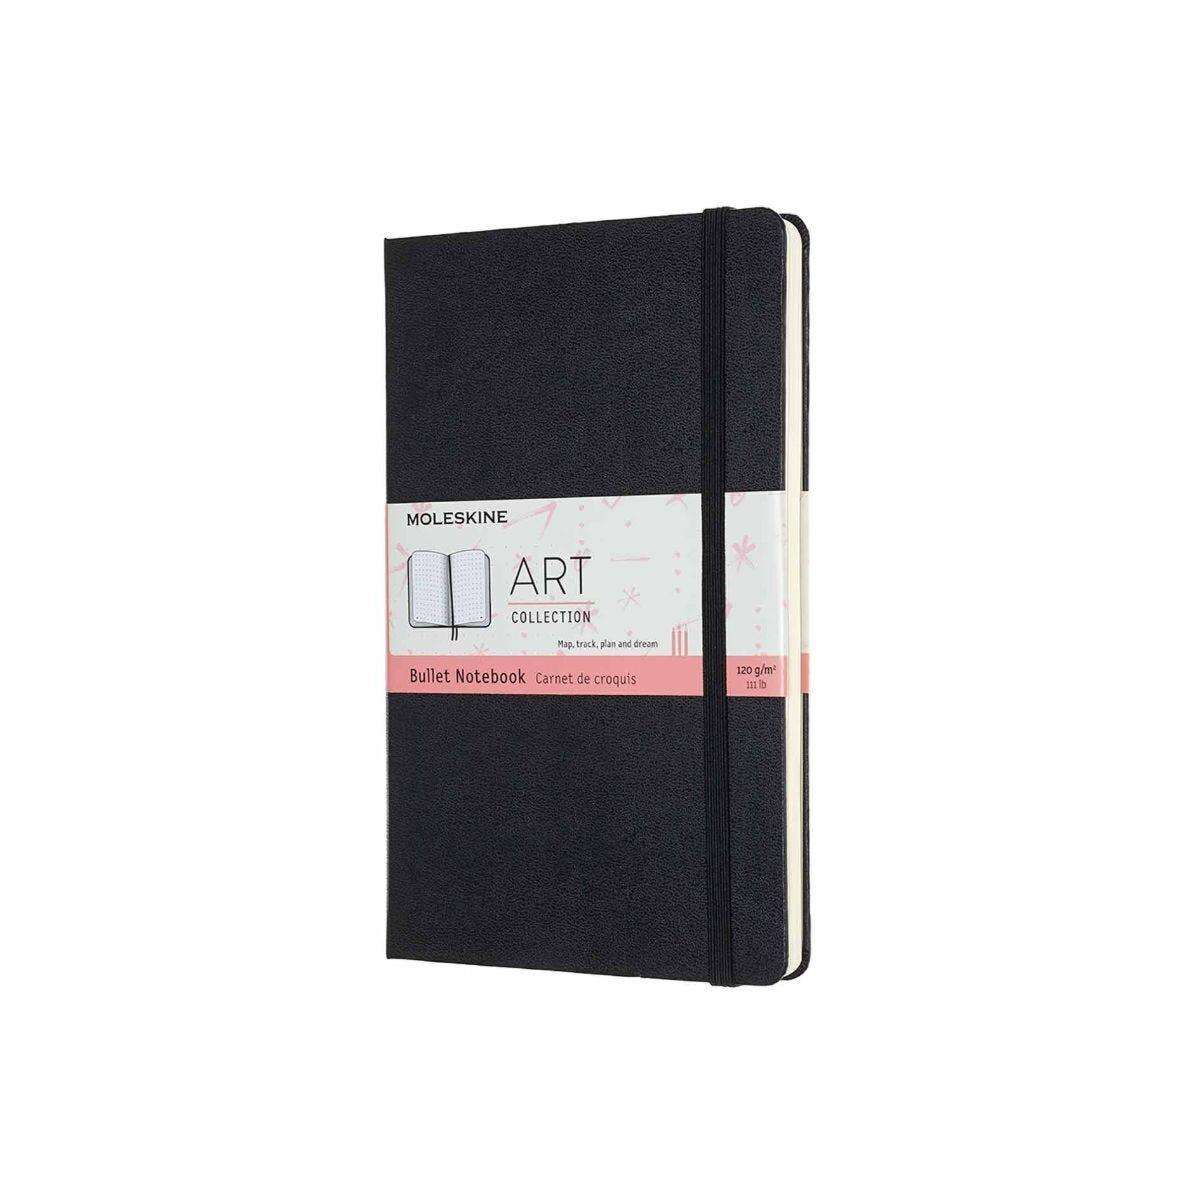 Moleskine Art Bullet Notebook Large